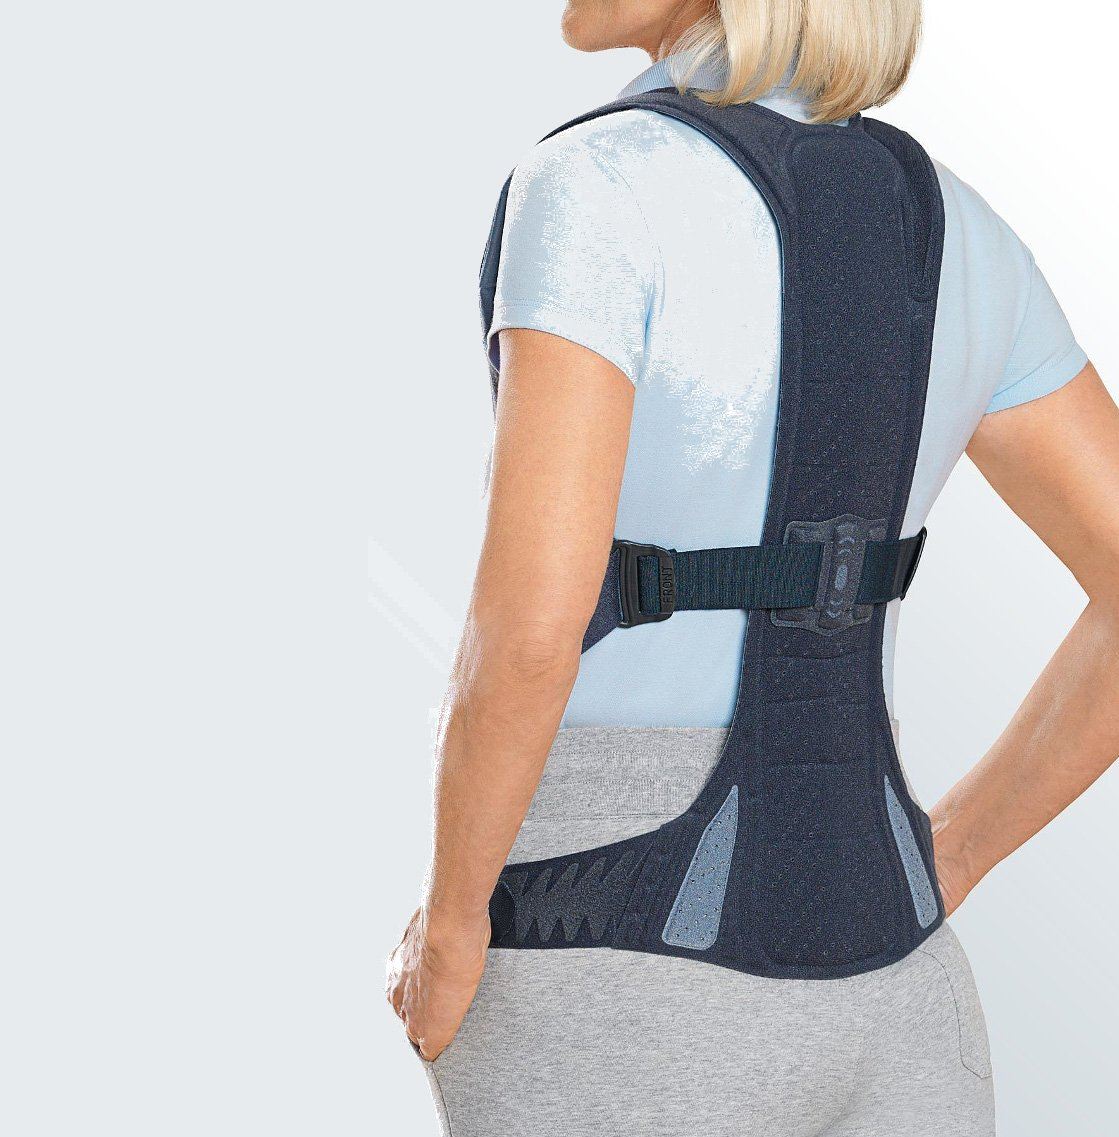 Busto indicato per fratture vertebrali